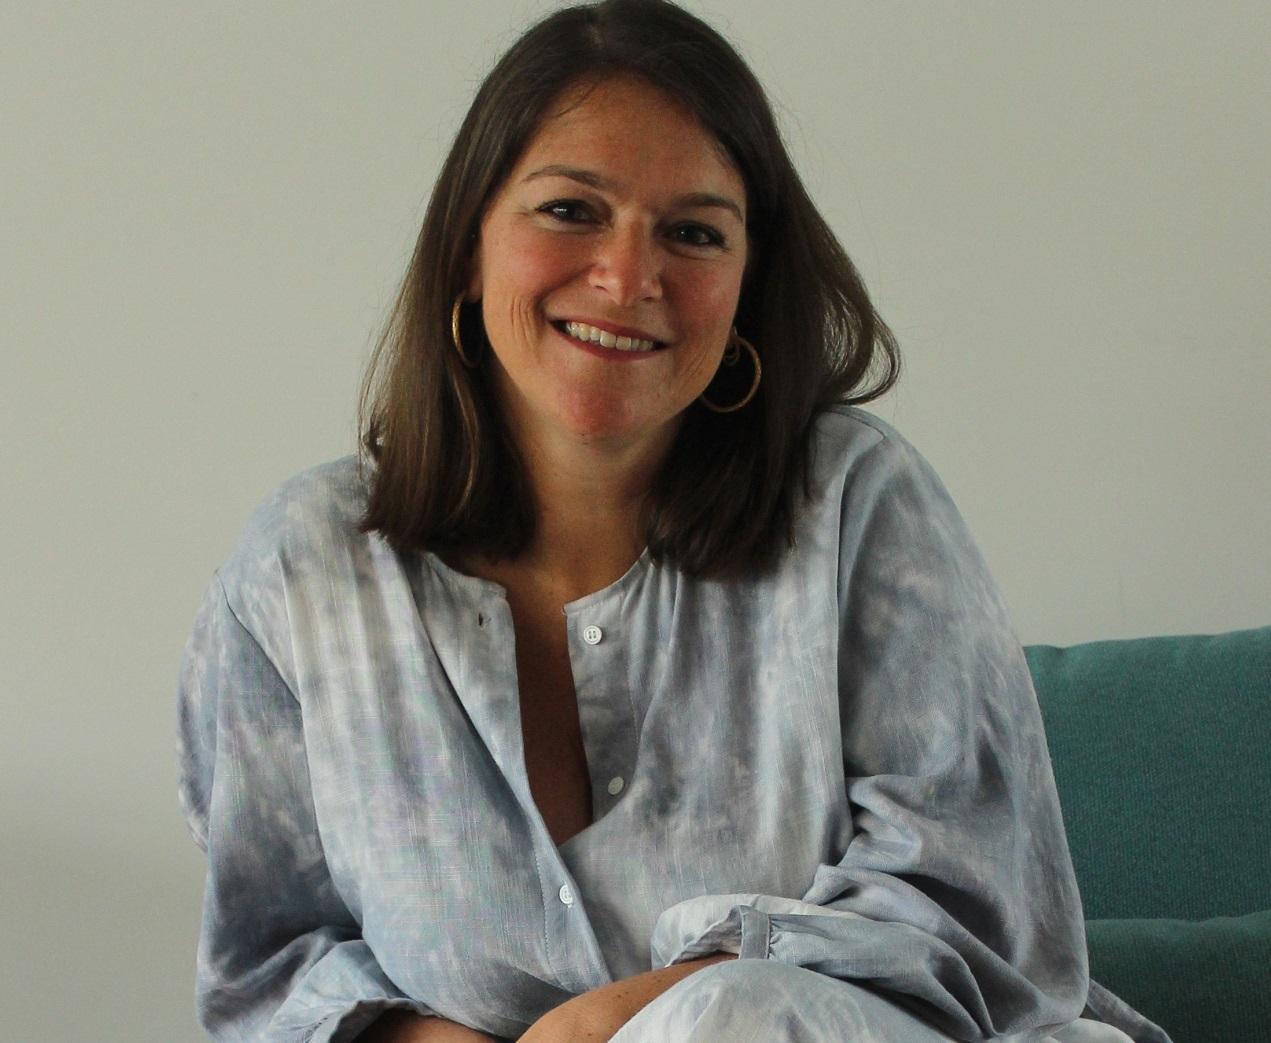 Vera Moura